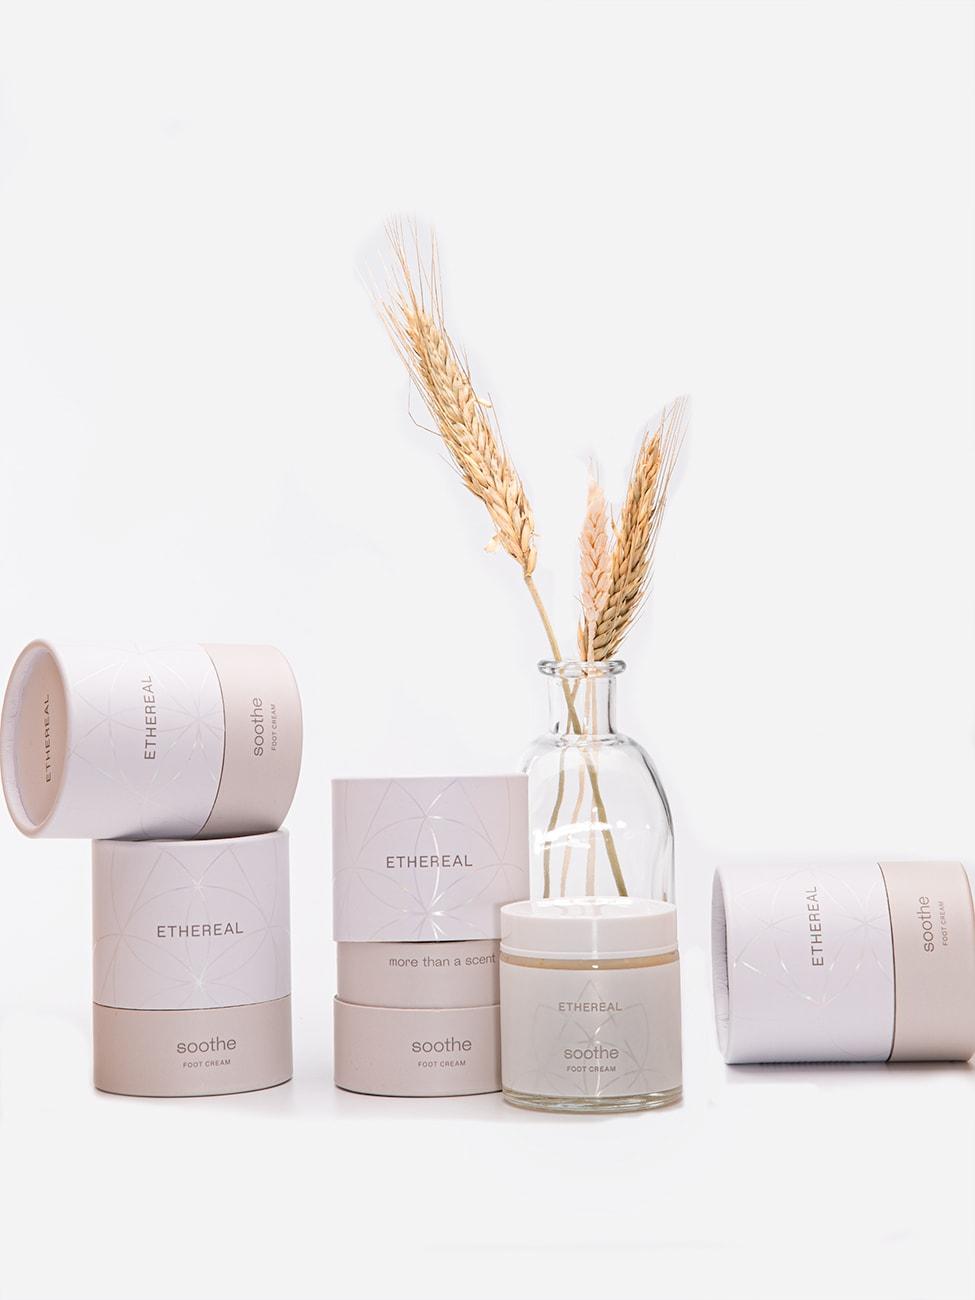 Soothe_cream_comp_Ethereal_Dermocosmetics_Skincare_Handmade_Greek_Products